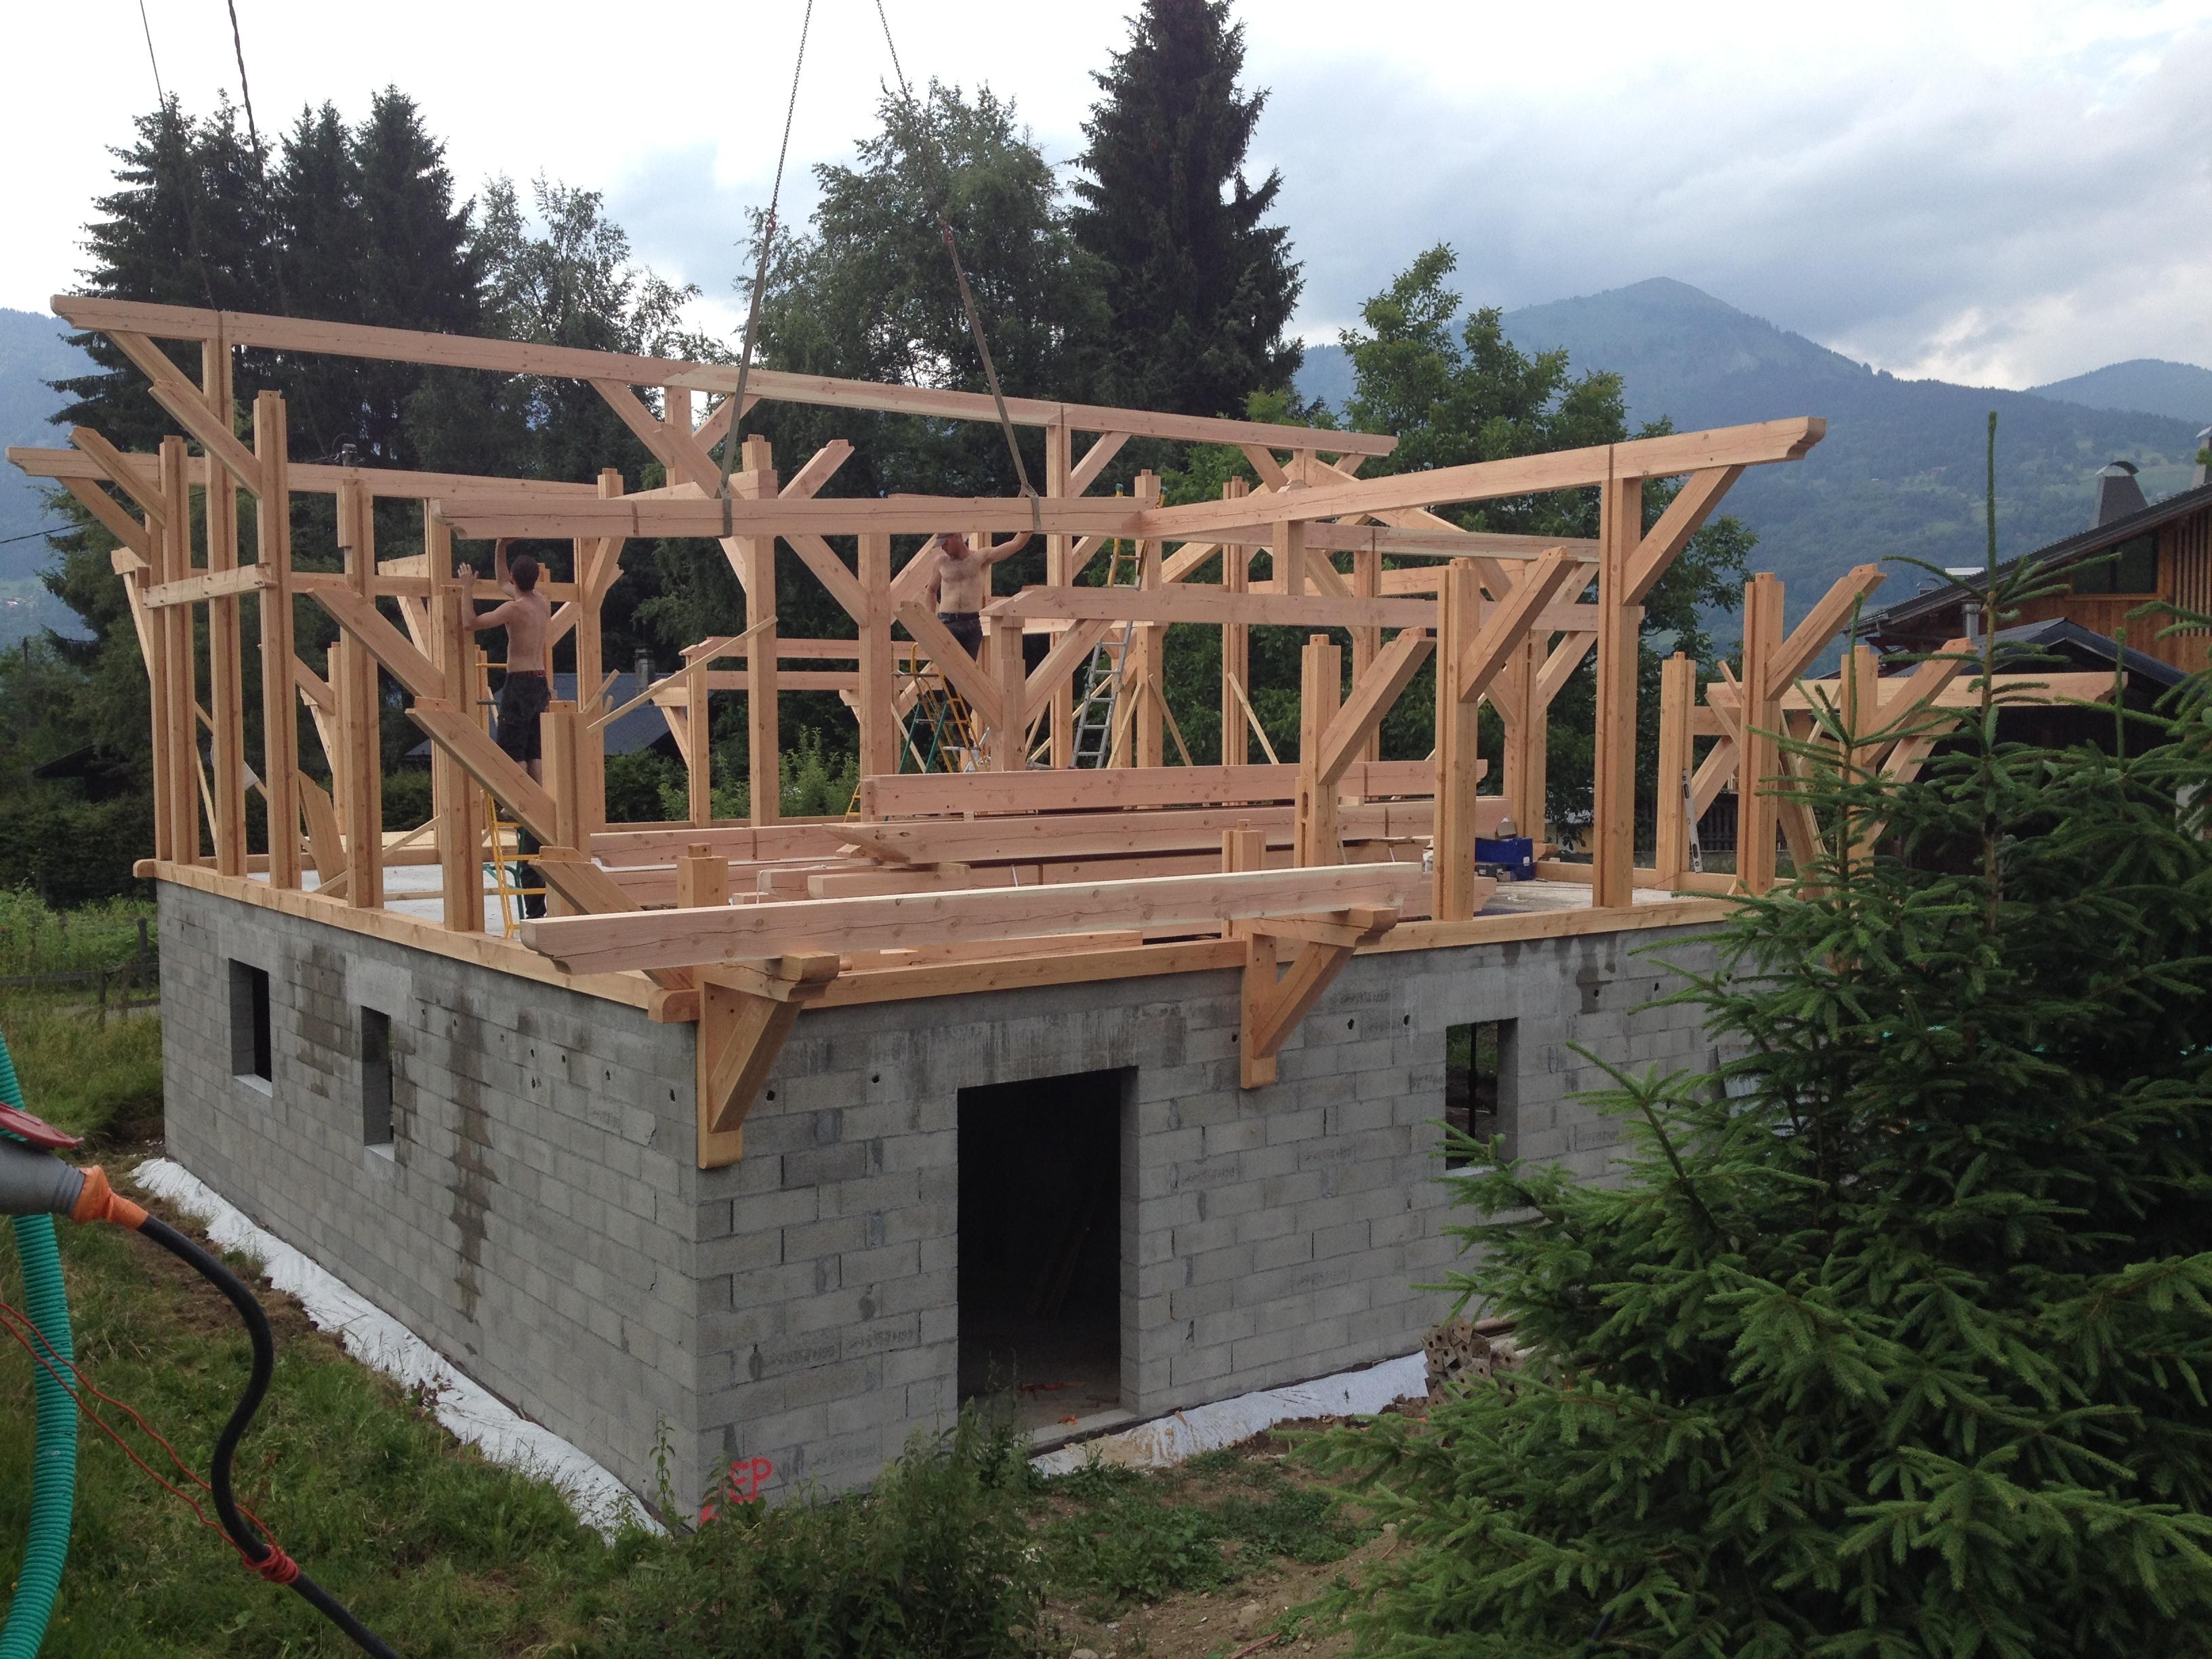 carpentry work commences at chalet allure chalet apassion in samo ns france luxury. Black Bedroom Furniture Sets. Home Design Ideas